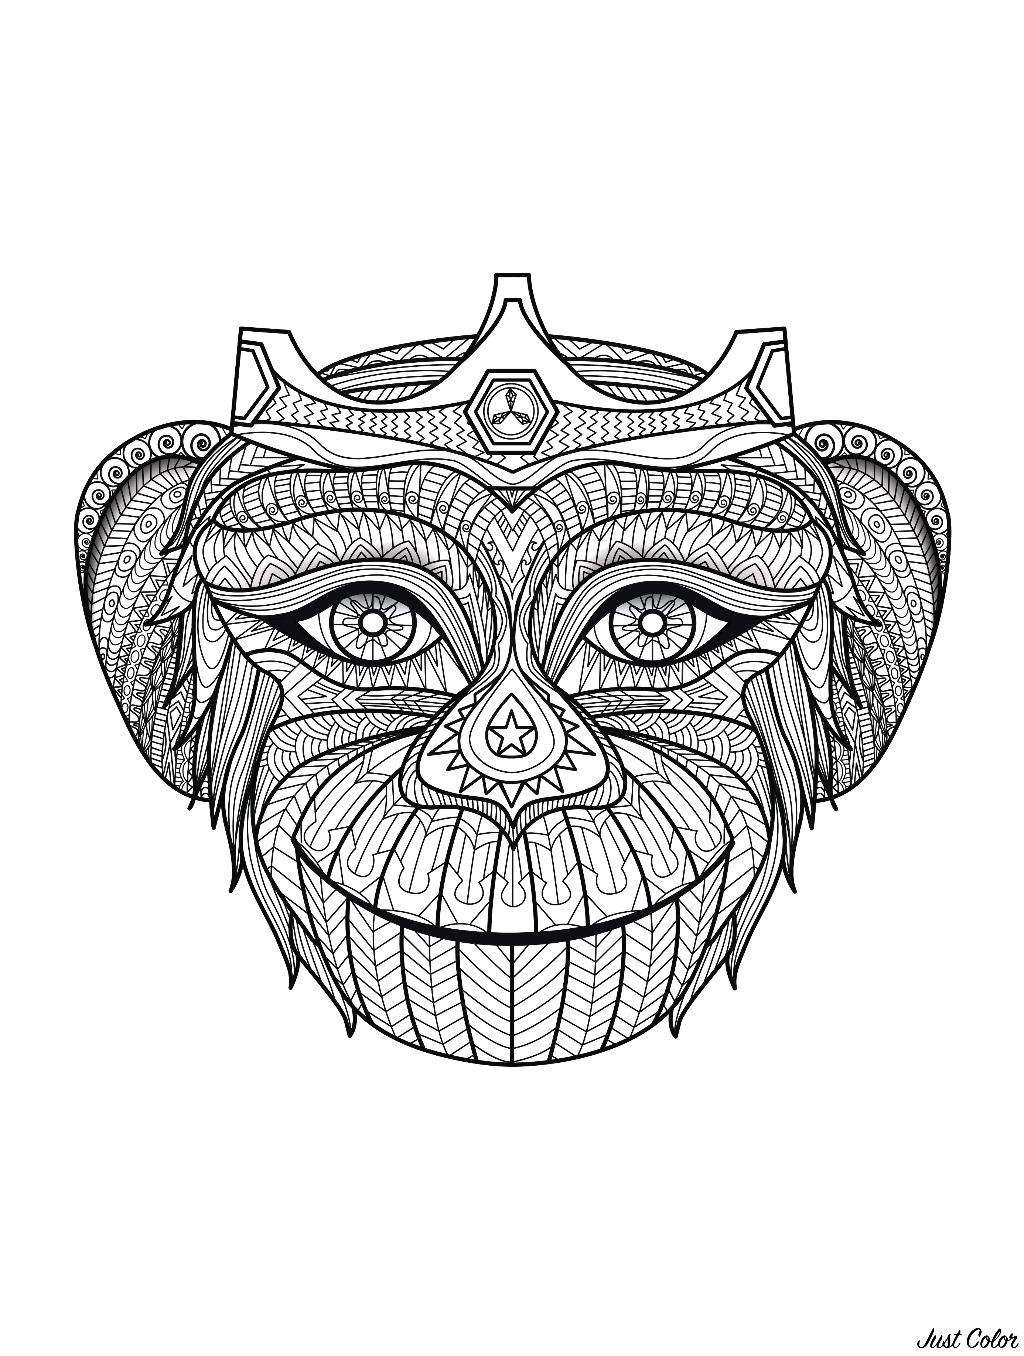 Crowned monkey's head